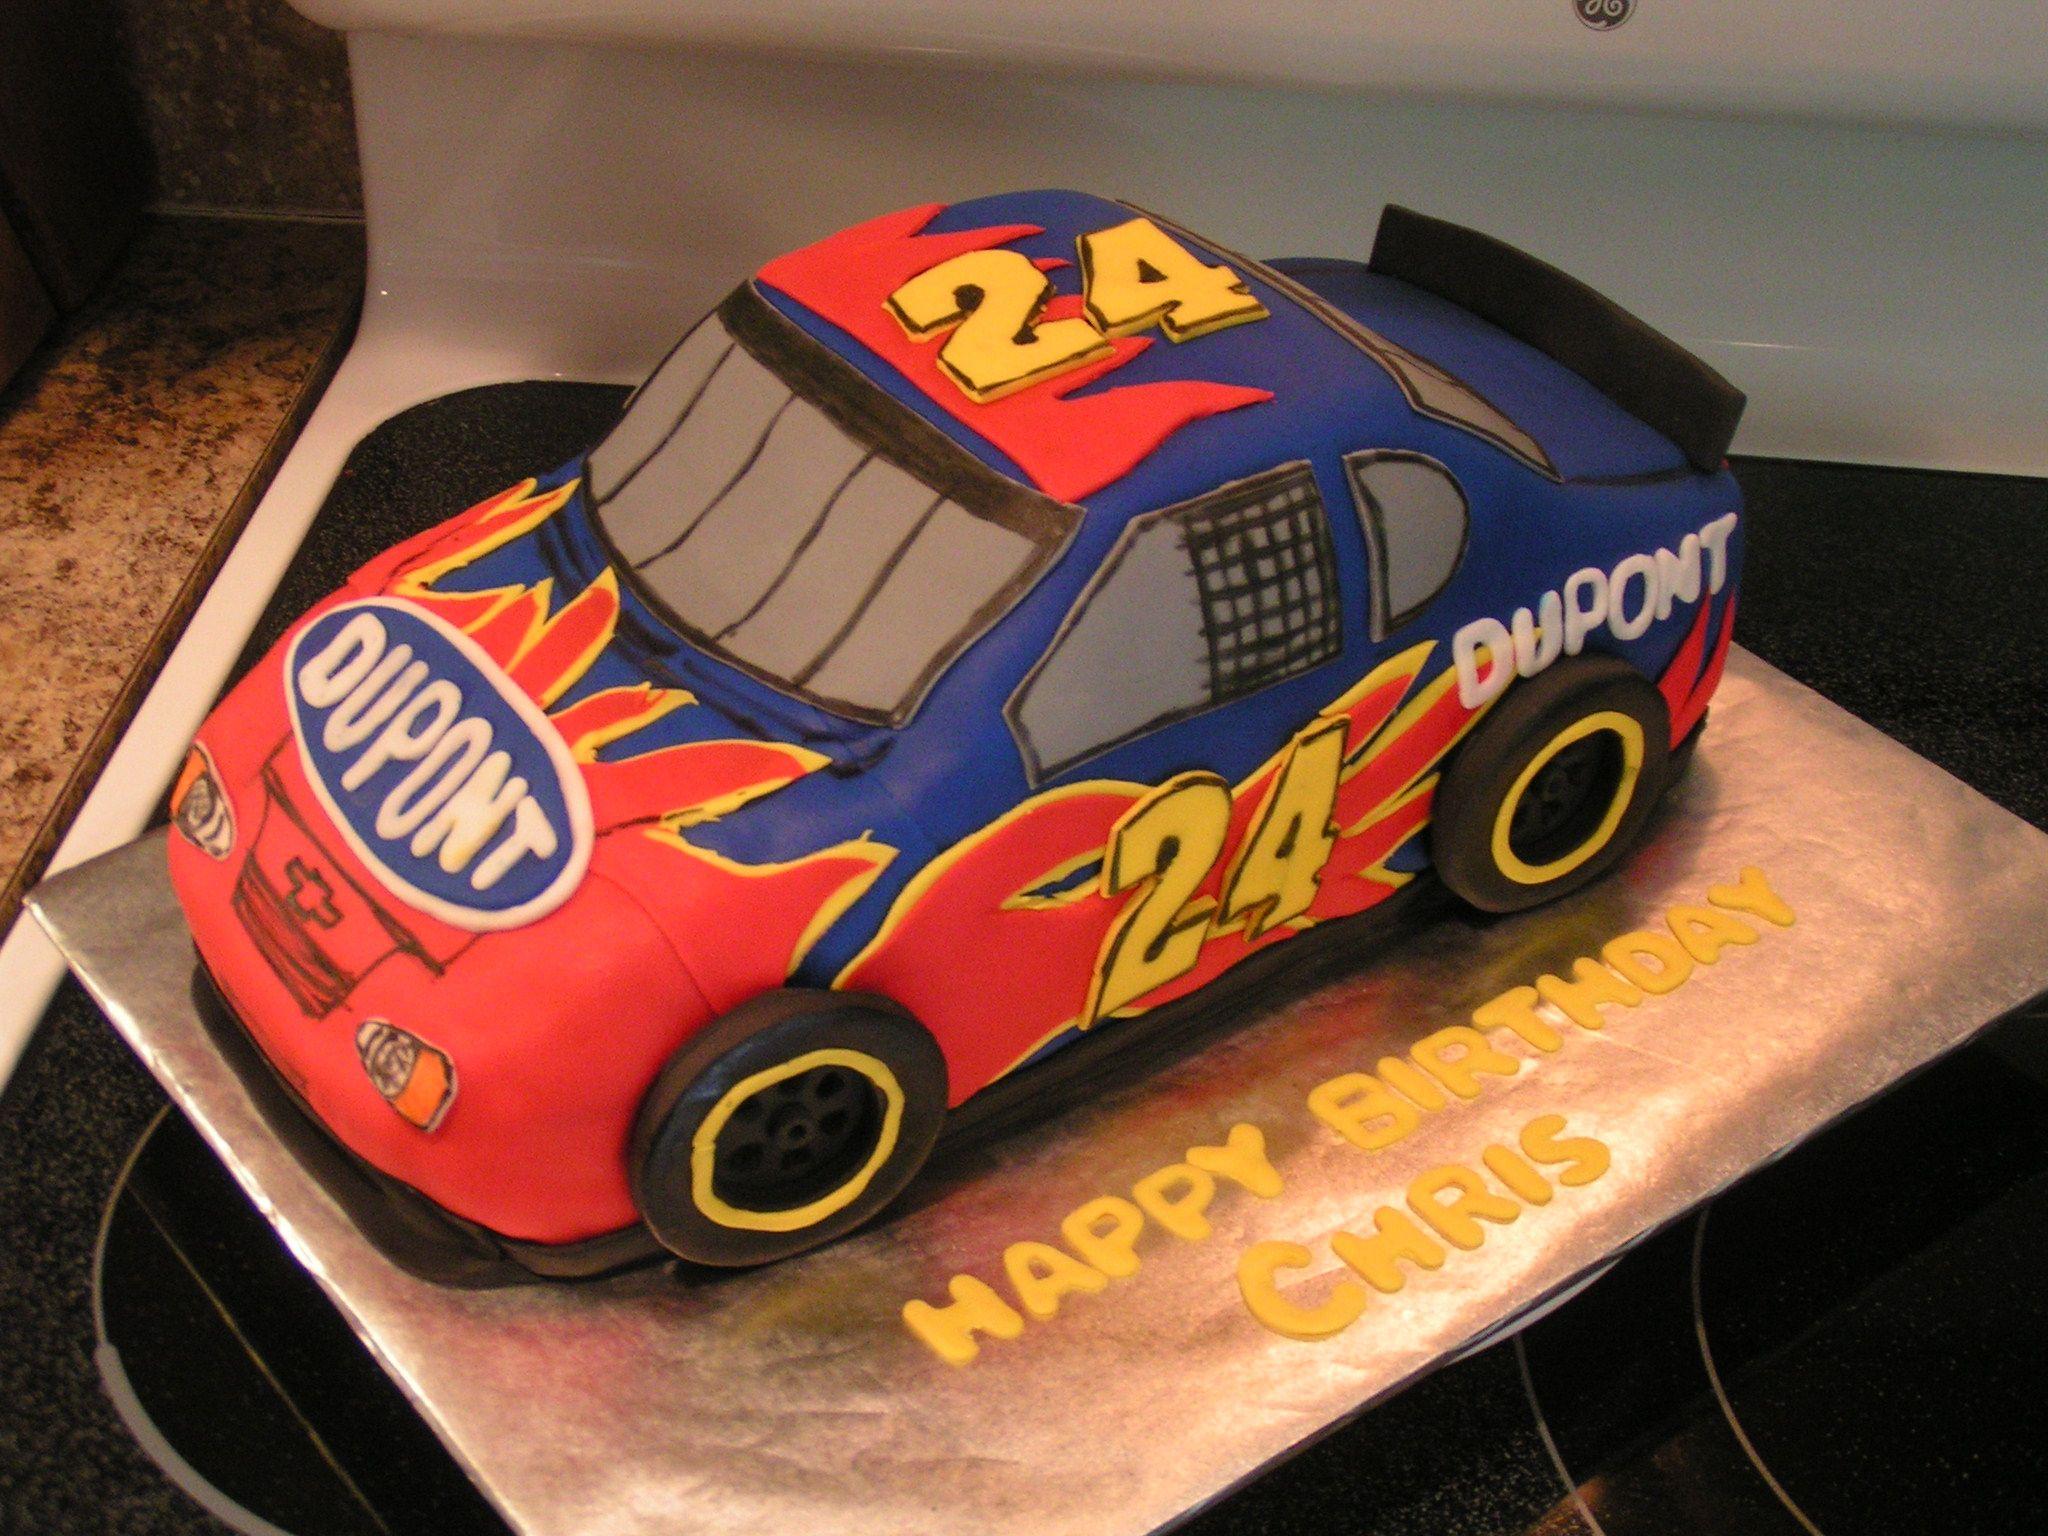 Jeff Gordon Cake With Images Nascar Cake Jeff Gordon Fondant